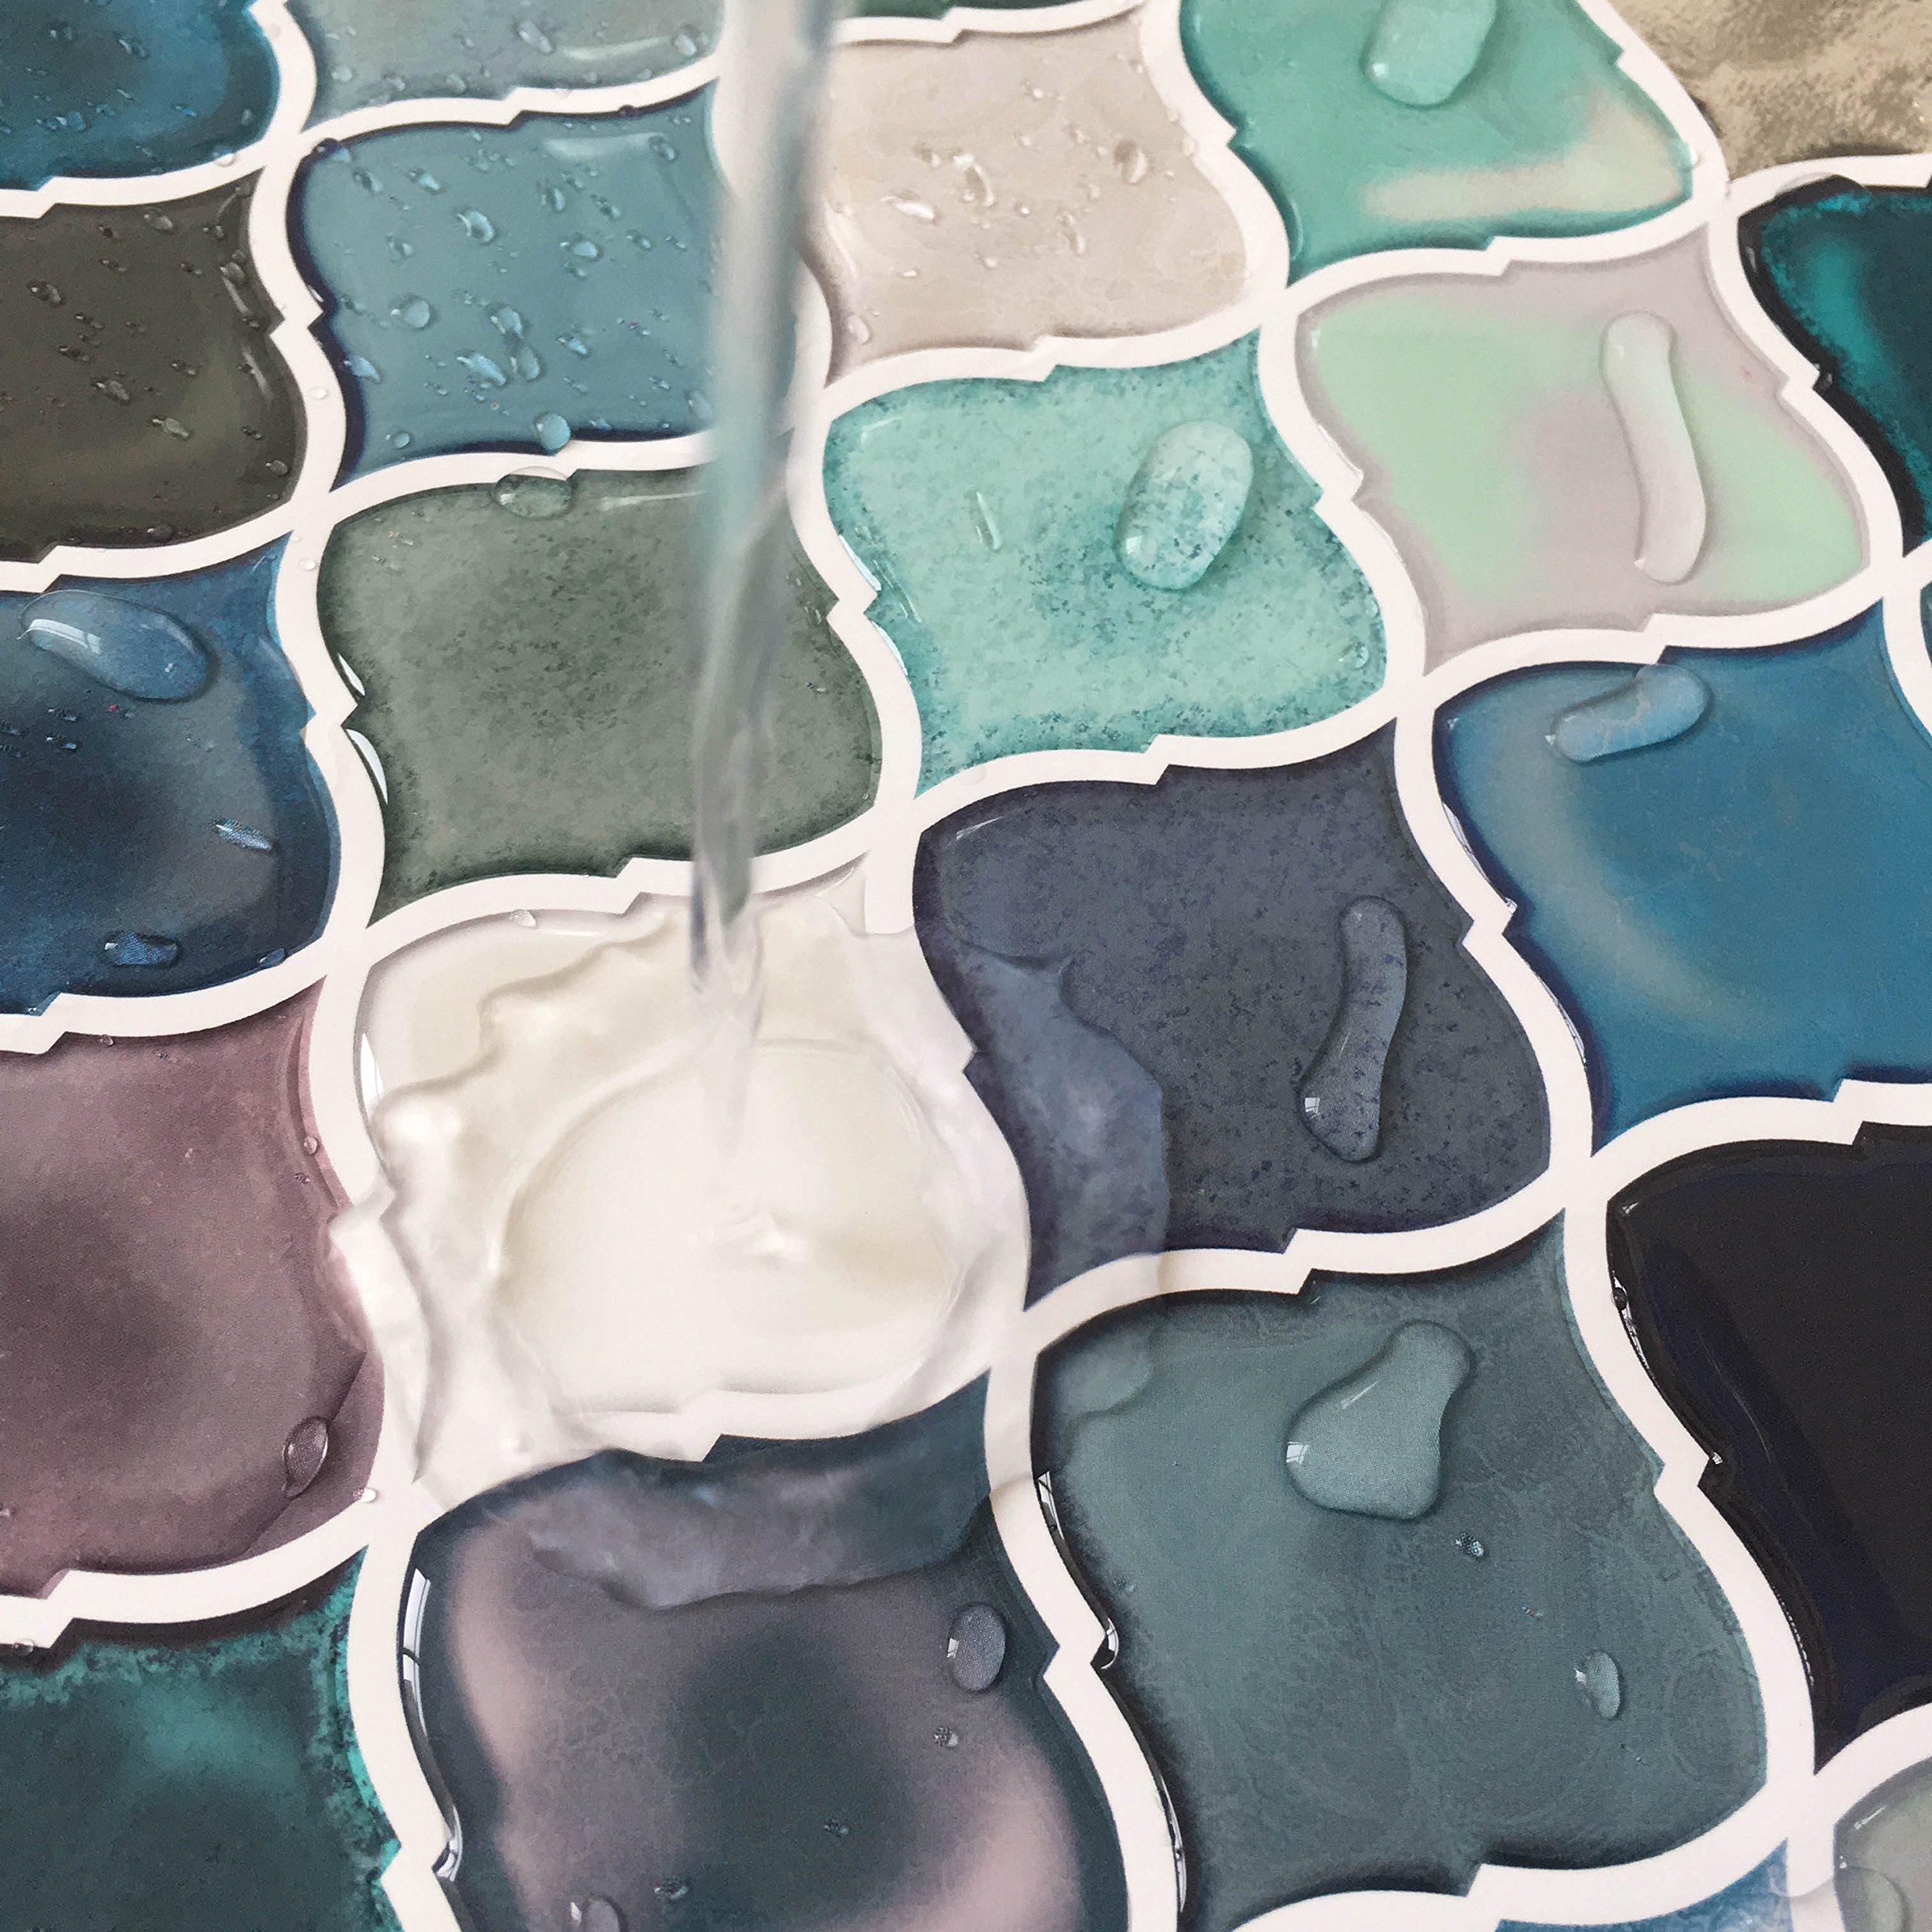 Fantastic 1 Inch Hexagon Floor Tiles Huge 17 X 17 Floor Tile Round 2 X 4 Ceiling Tiles 24X24 Drop Ceiling Tiles Youthful 3 X 12 Subway Tile Bright3 X 9 Subway Tile Self Adhesive Tiles,Peel And Stick Tile Backsplash For Kitchen ..